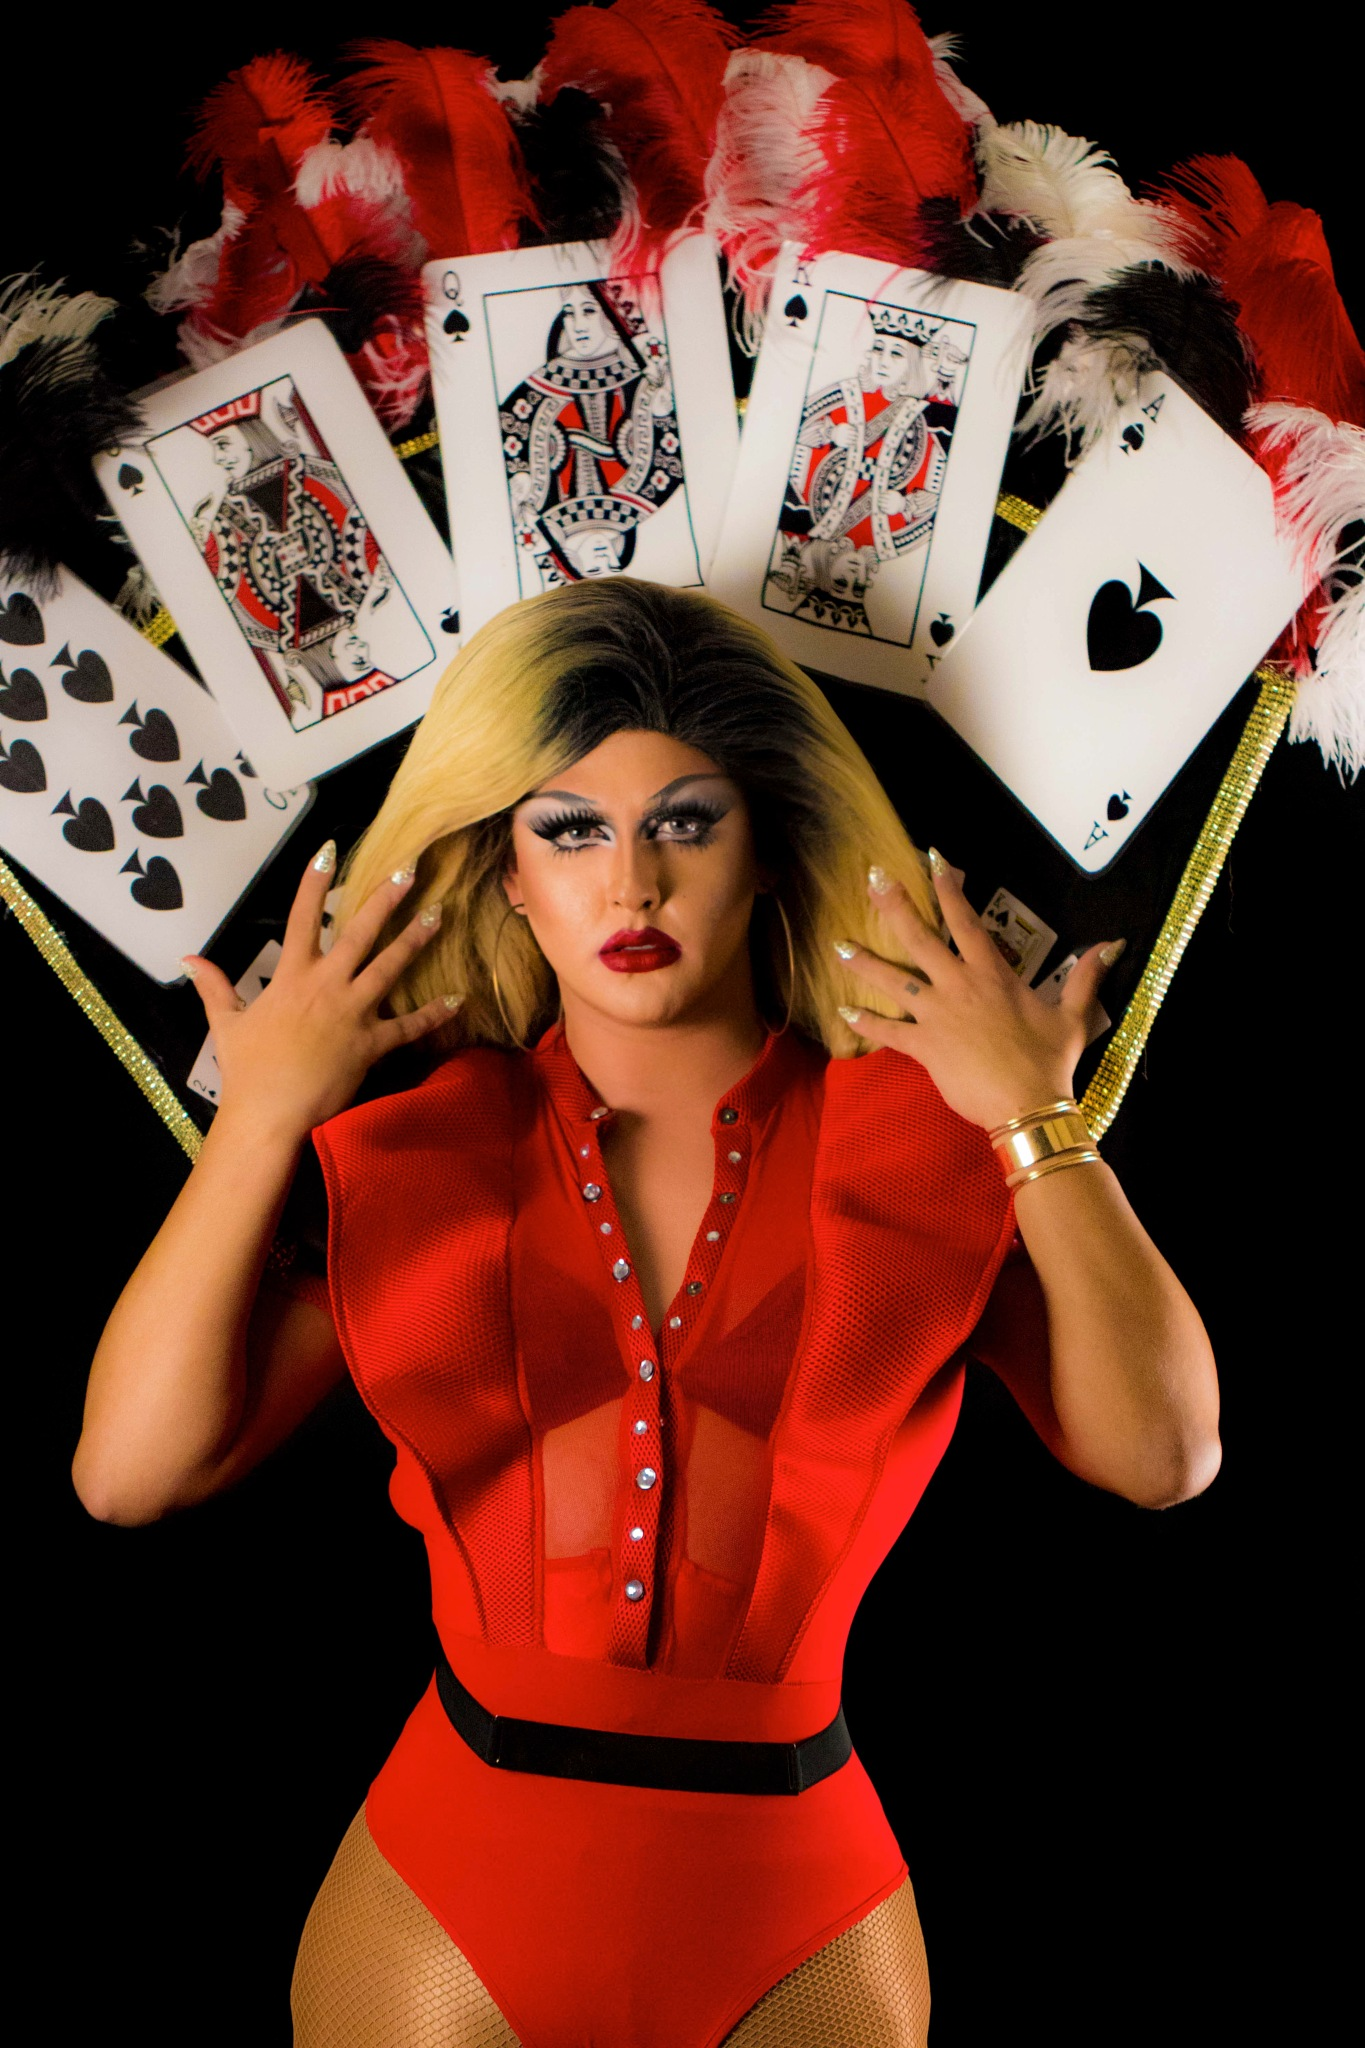 Poker face by brandonhill__